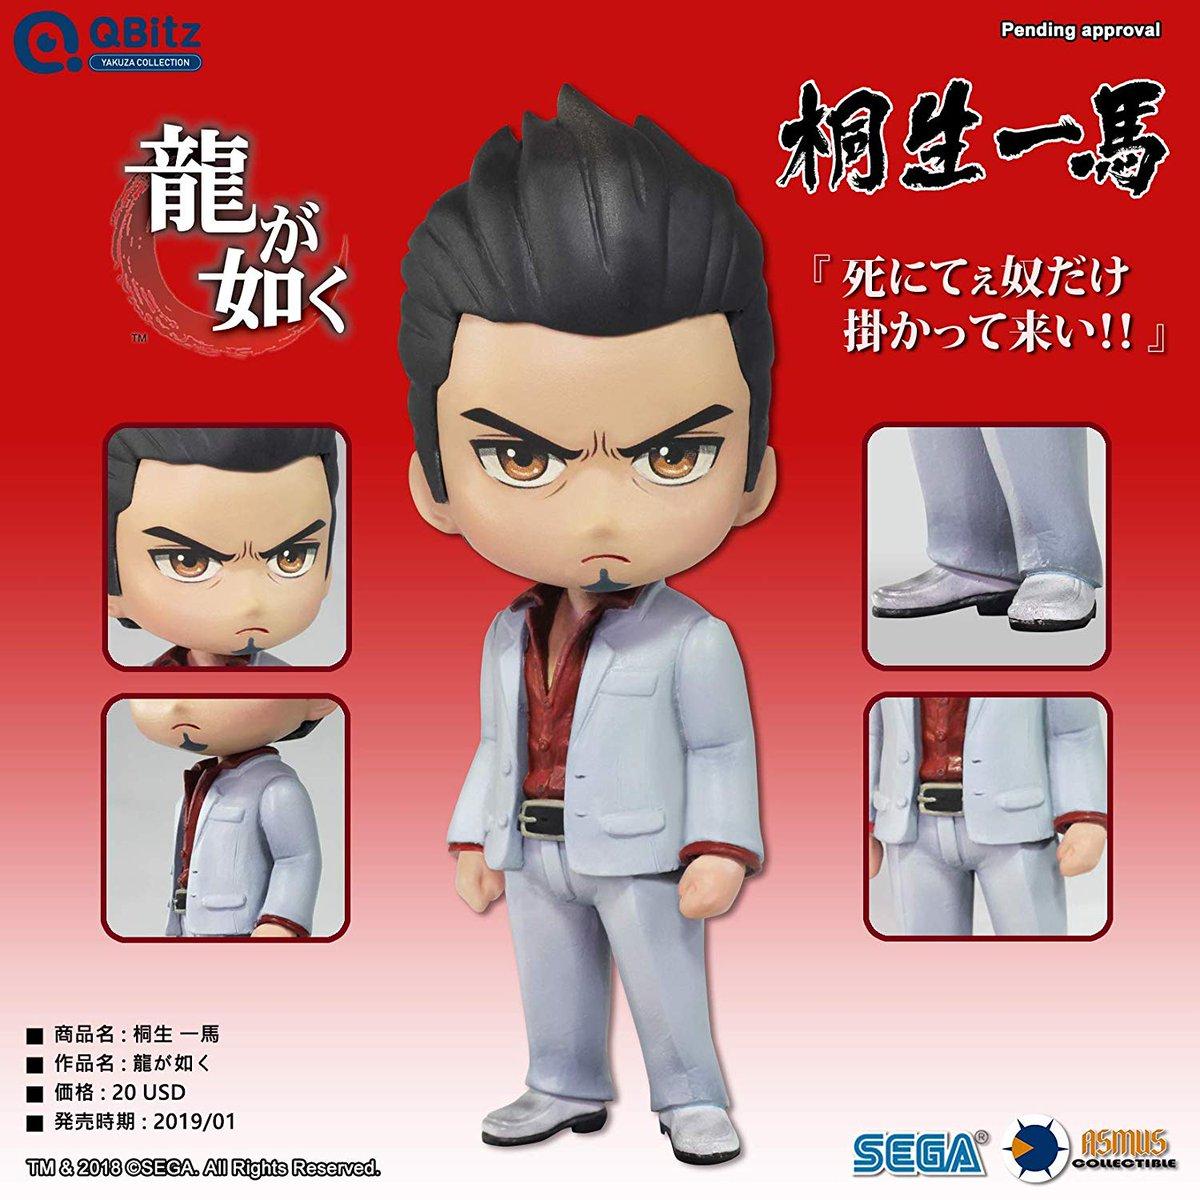 Yakuza Qbitz figures - Kiryu Kazuma and Goro Majima up for preorder on Amazon ($20 each) Kiryu Kazuma https://amzn.to/2N8hVms Goro Majima https://amzn.to/2N6eyfv